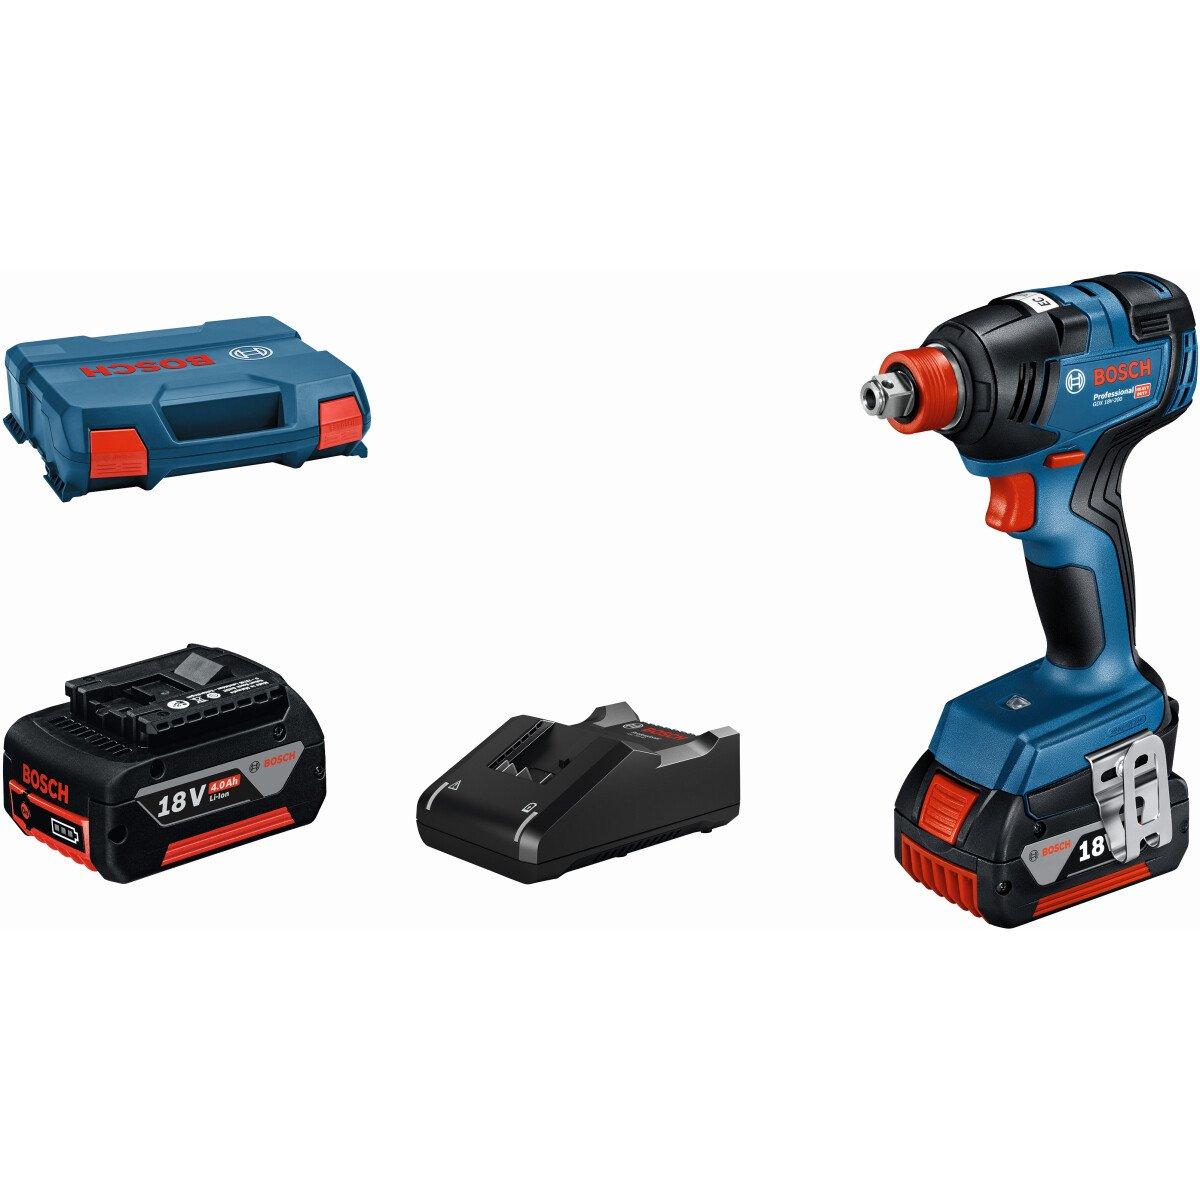 "Bosch GDX18V-200 KIT 18v 1/4"" BRUSHLESS Impact Driver/Wrench (2x5.0Ah) in L Case"